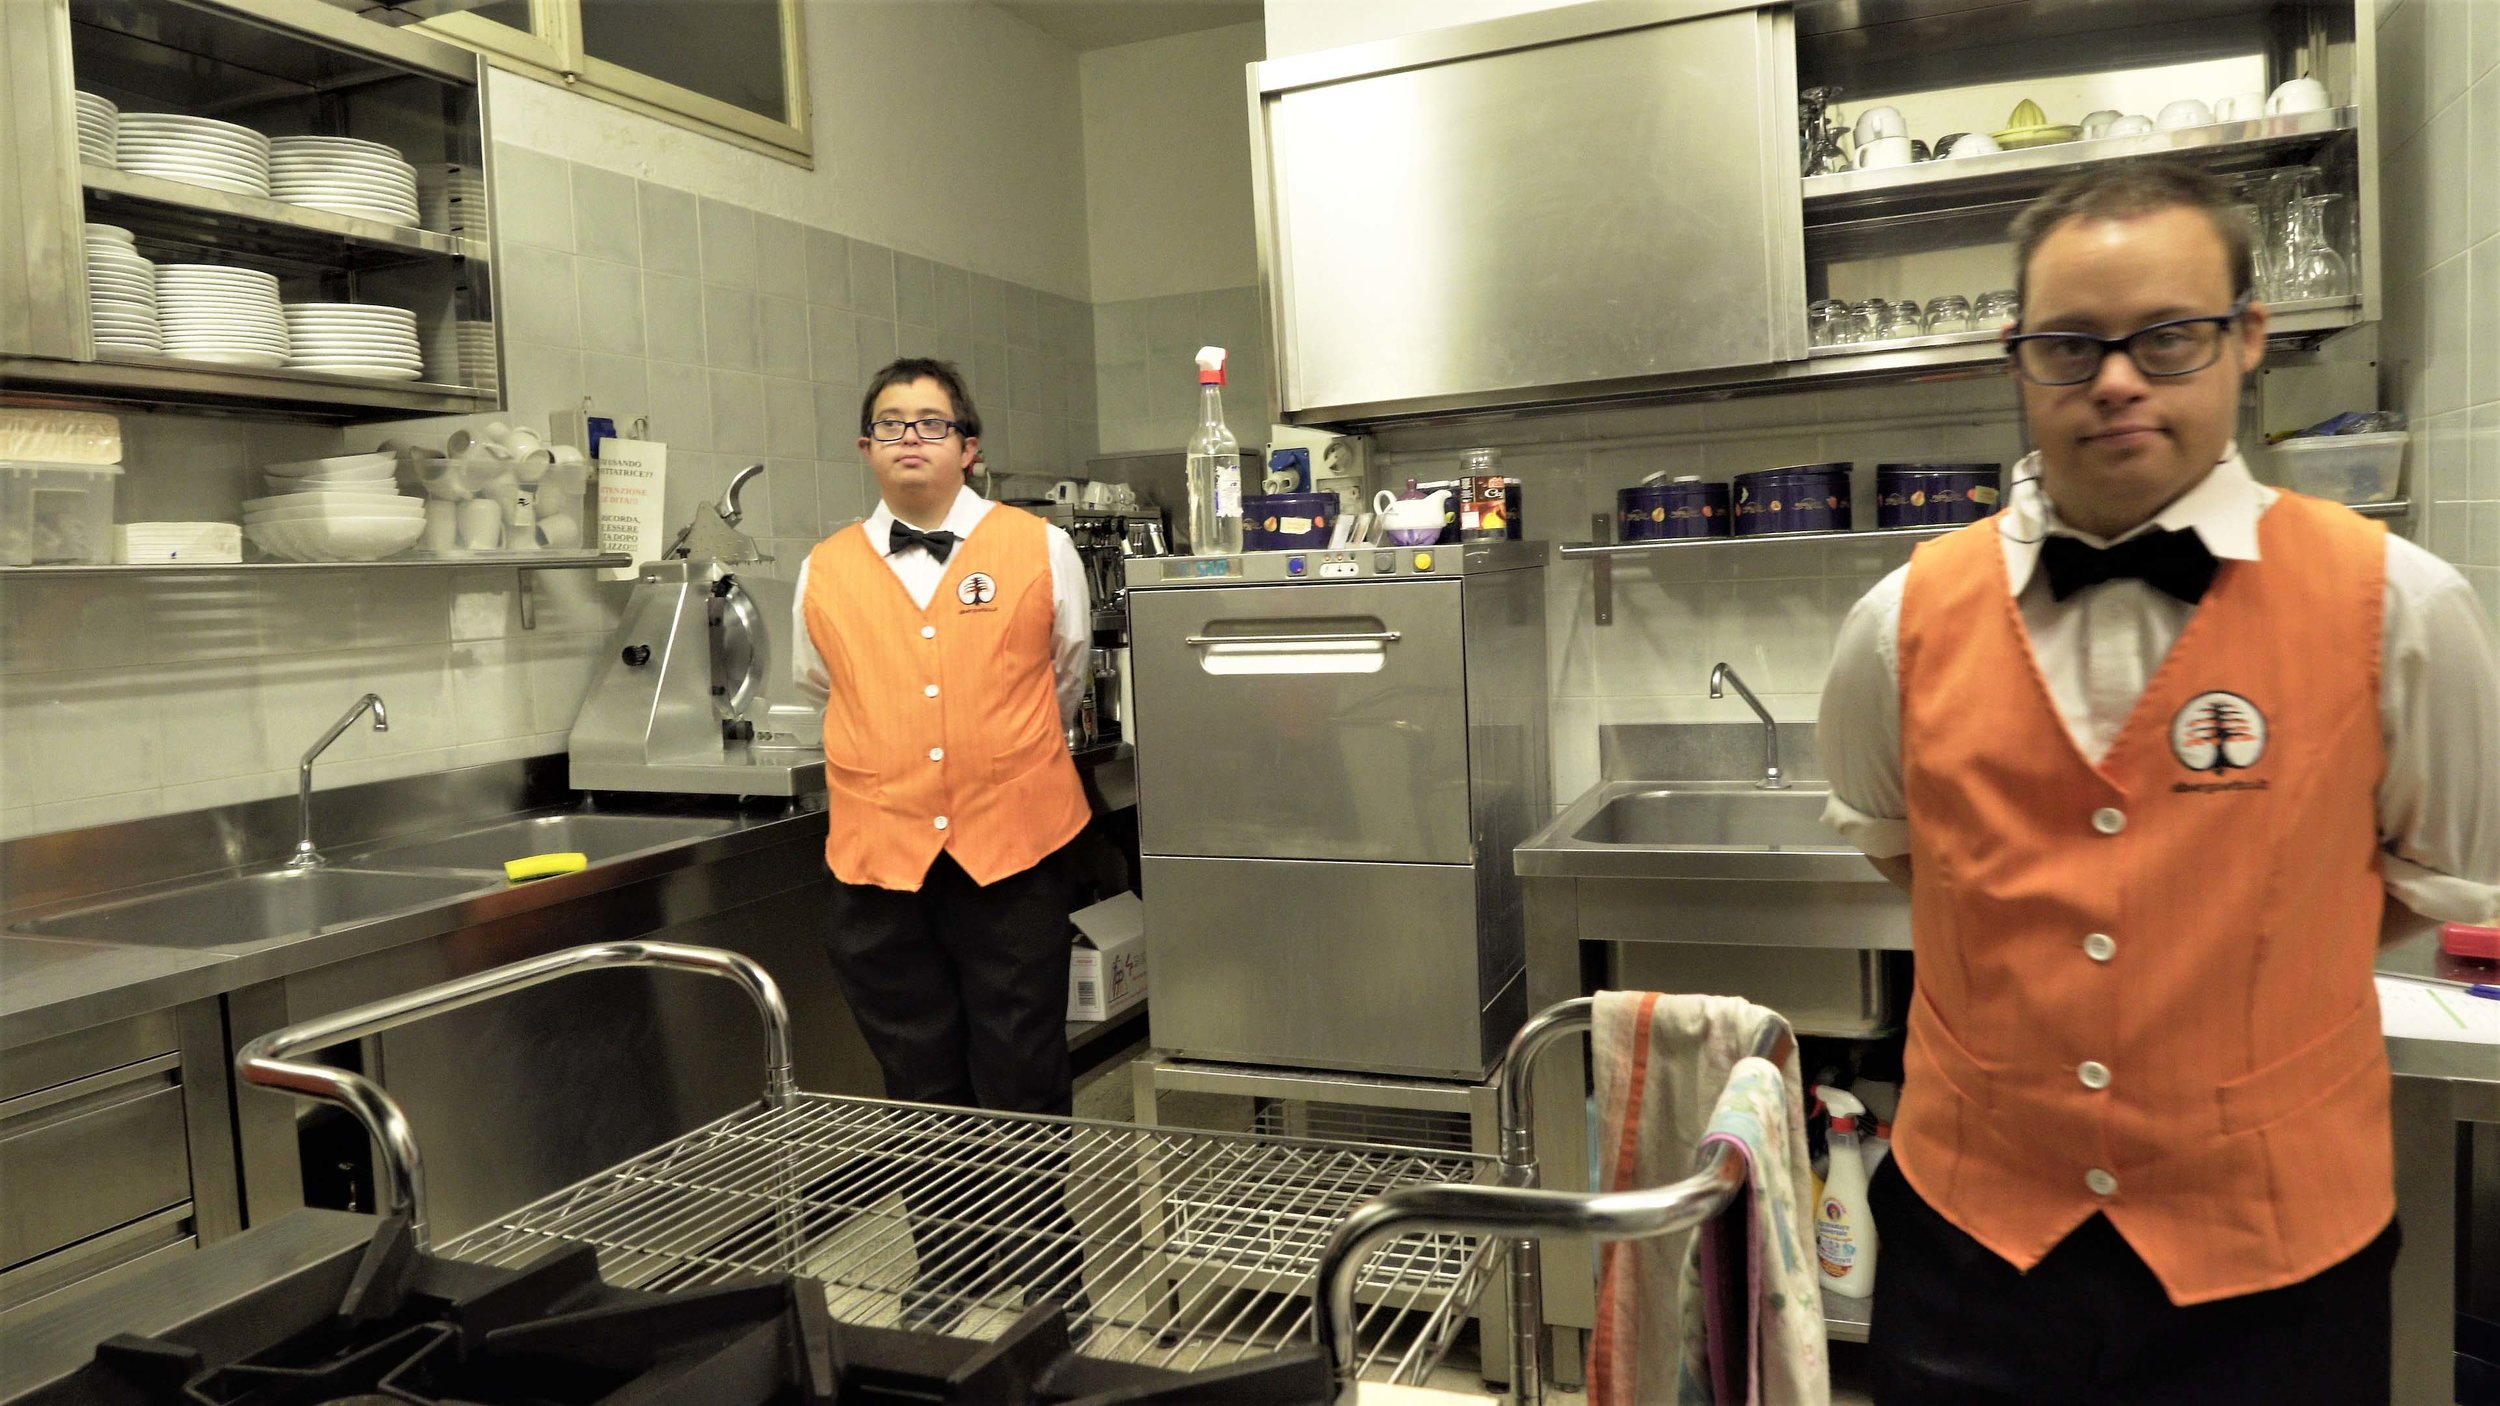 Mirko Piras & Antonio Mozzo staff at the Albergo Etico Asti, Italy